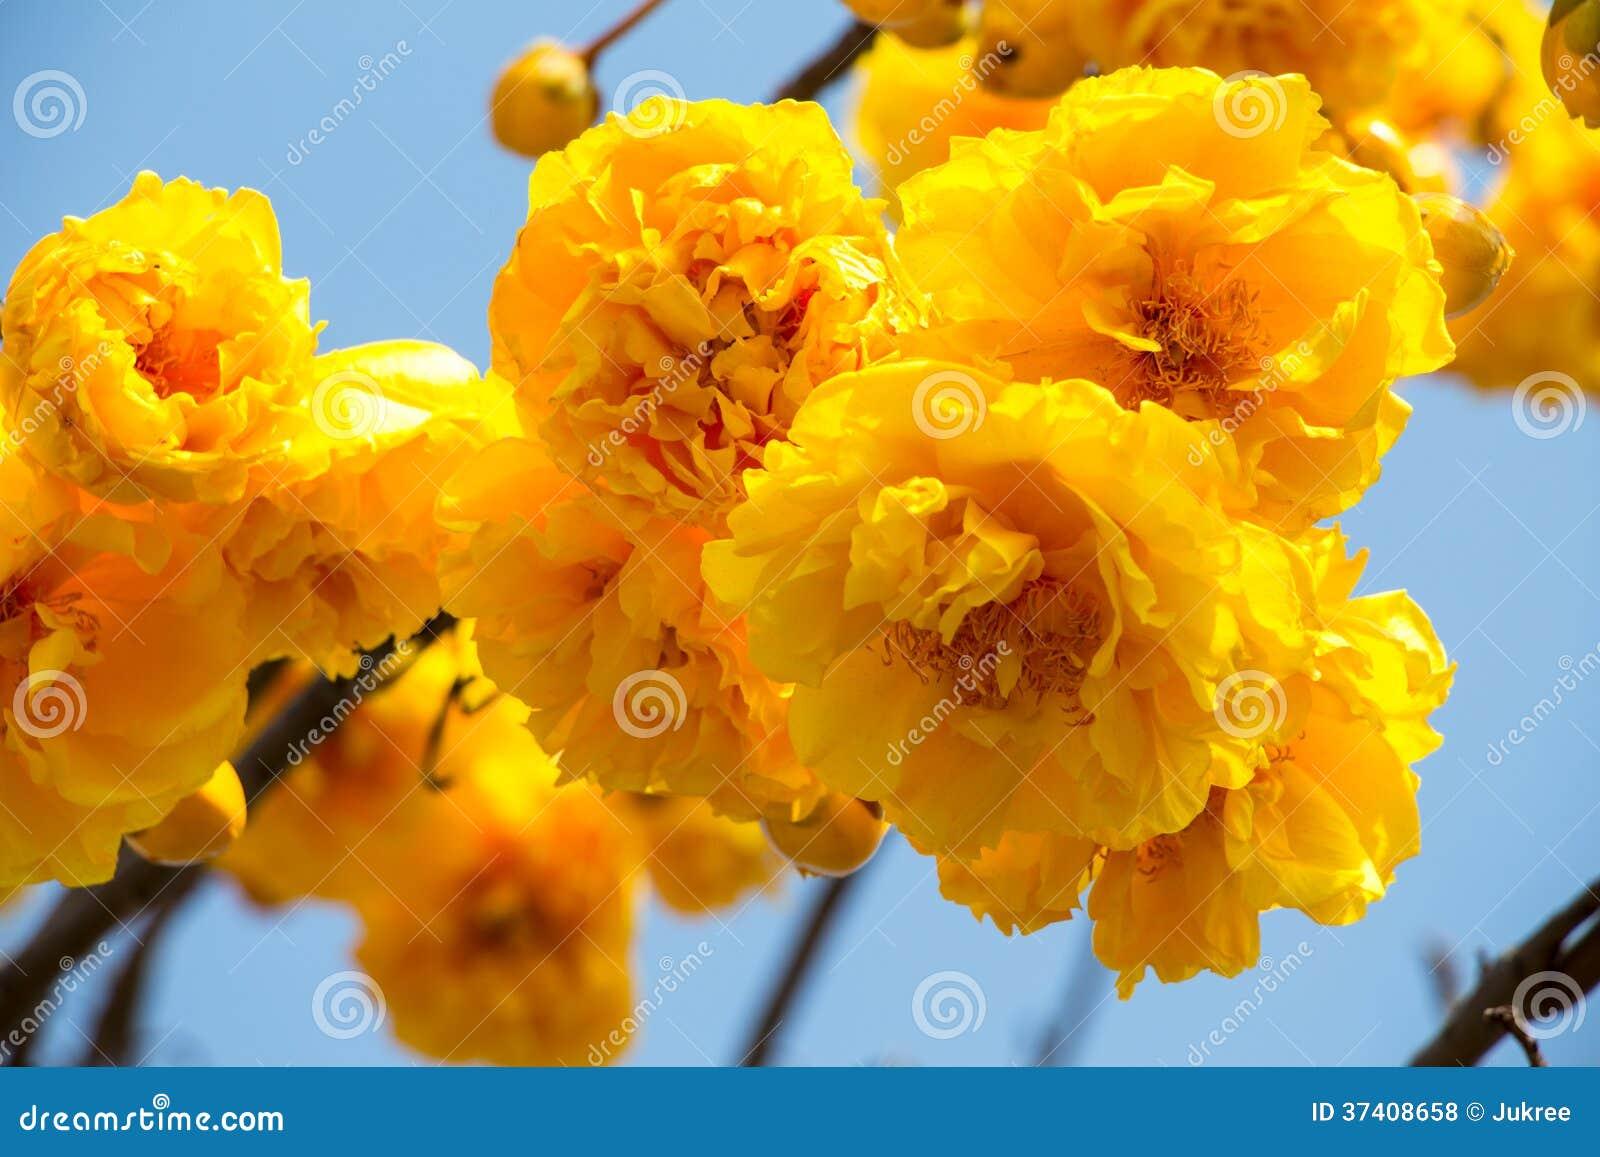 Yellow silk cotton tree flower stock photo image 37408658 - Trees that bloom yellow flowers ...